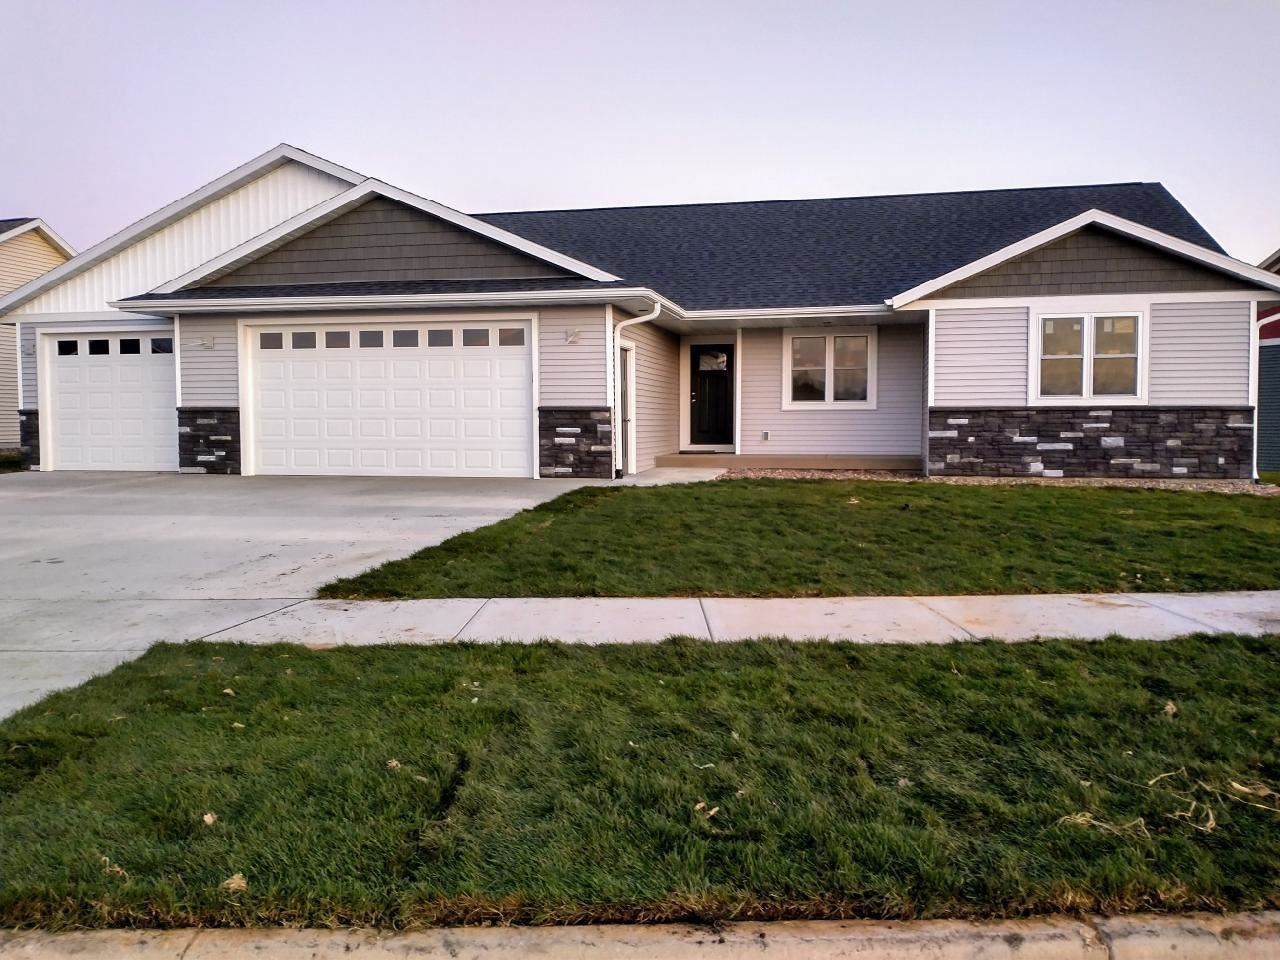 3105 Horton St, Holmen, WI 54636 - MLS#: 1717600